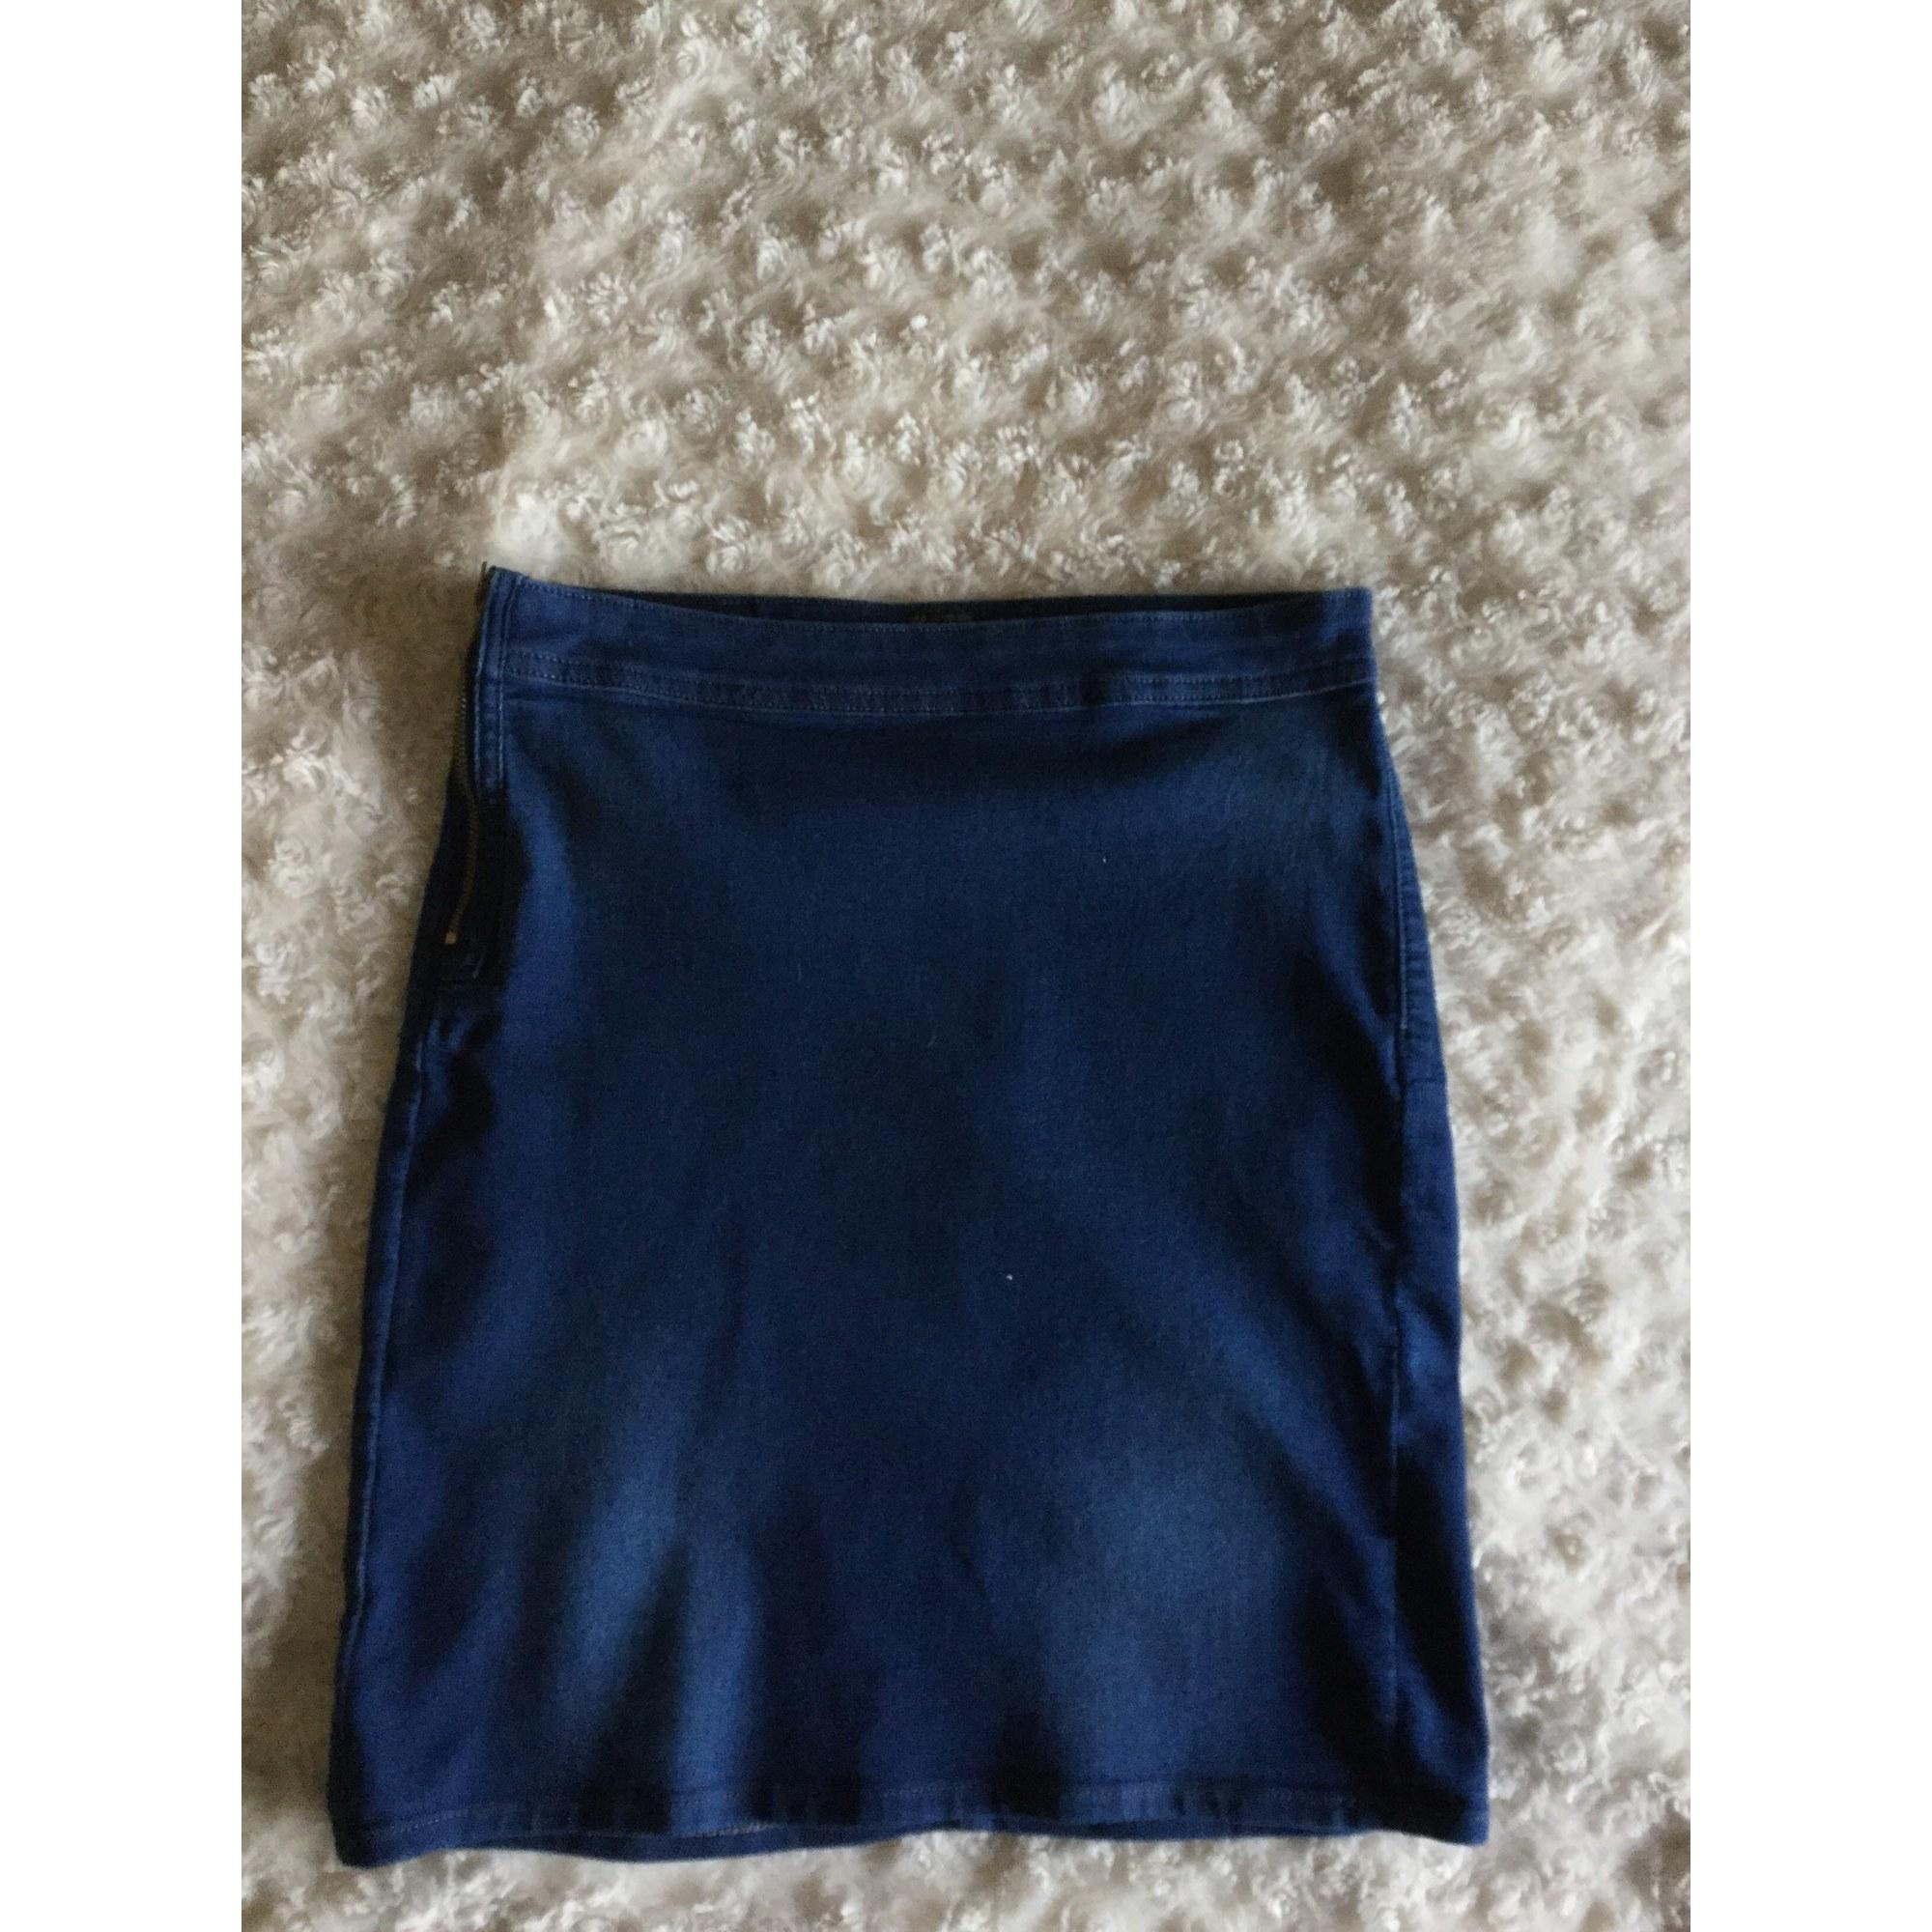 Jupe en jean LEE Bleu, bleu marine, bleu turquoise